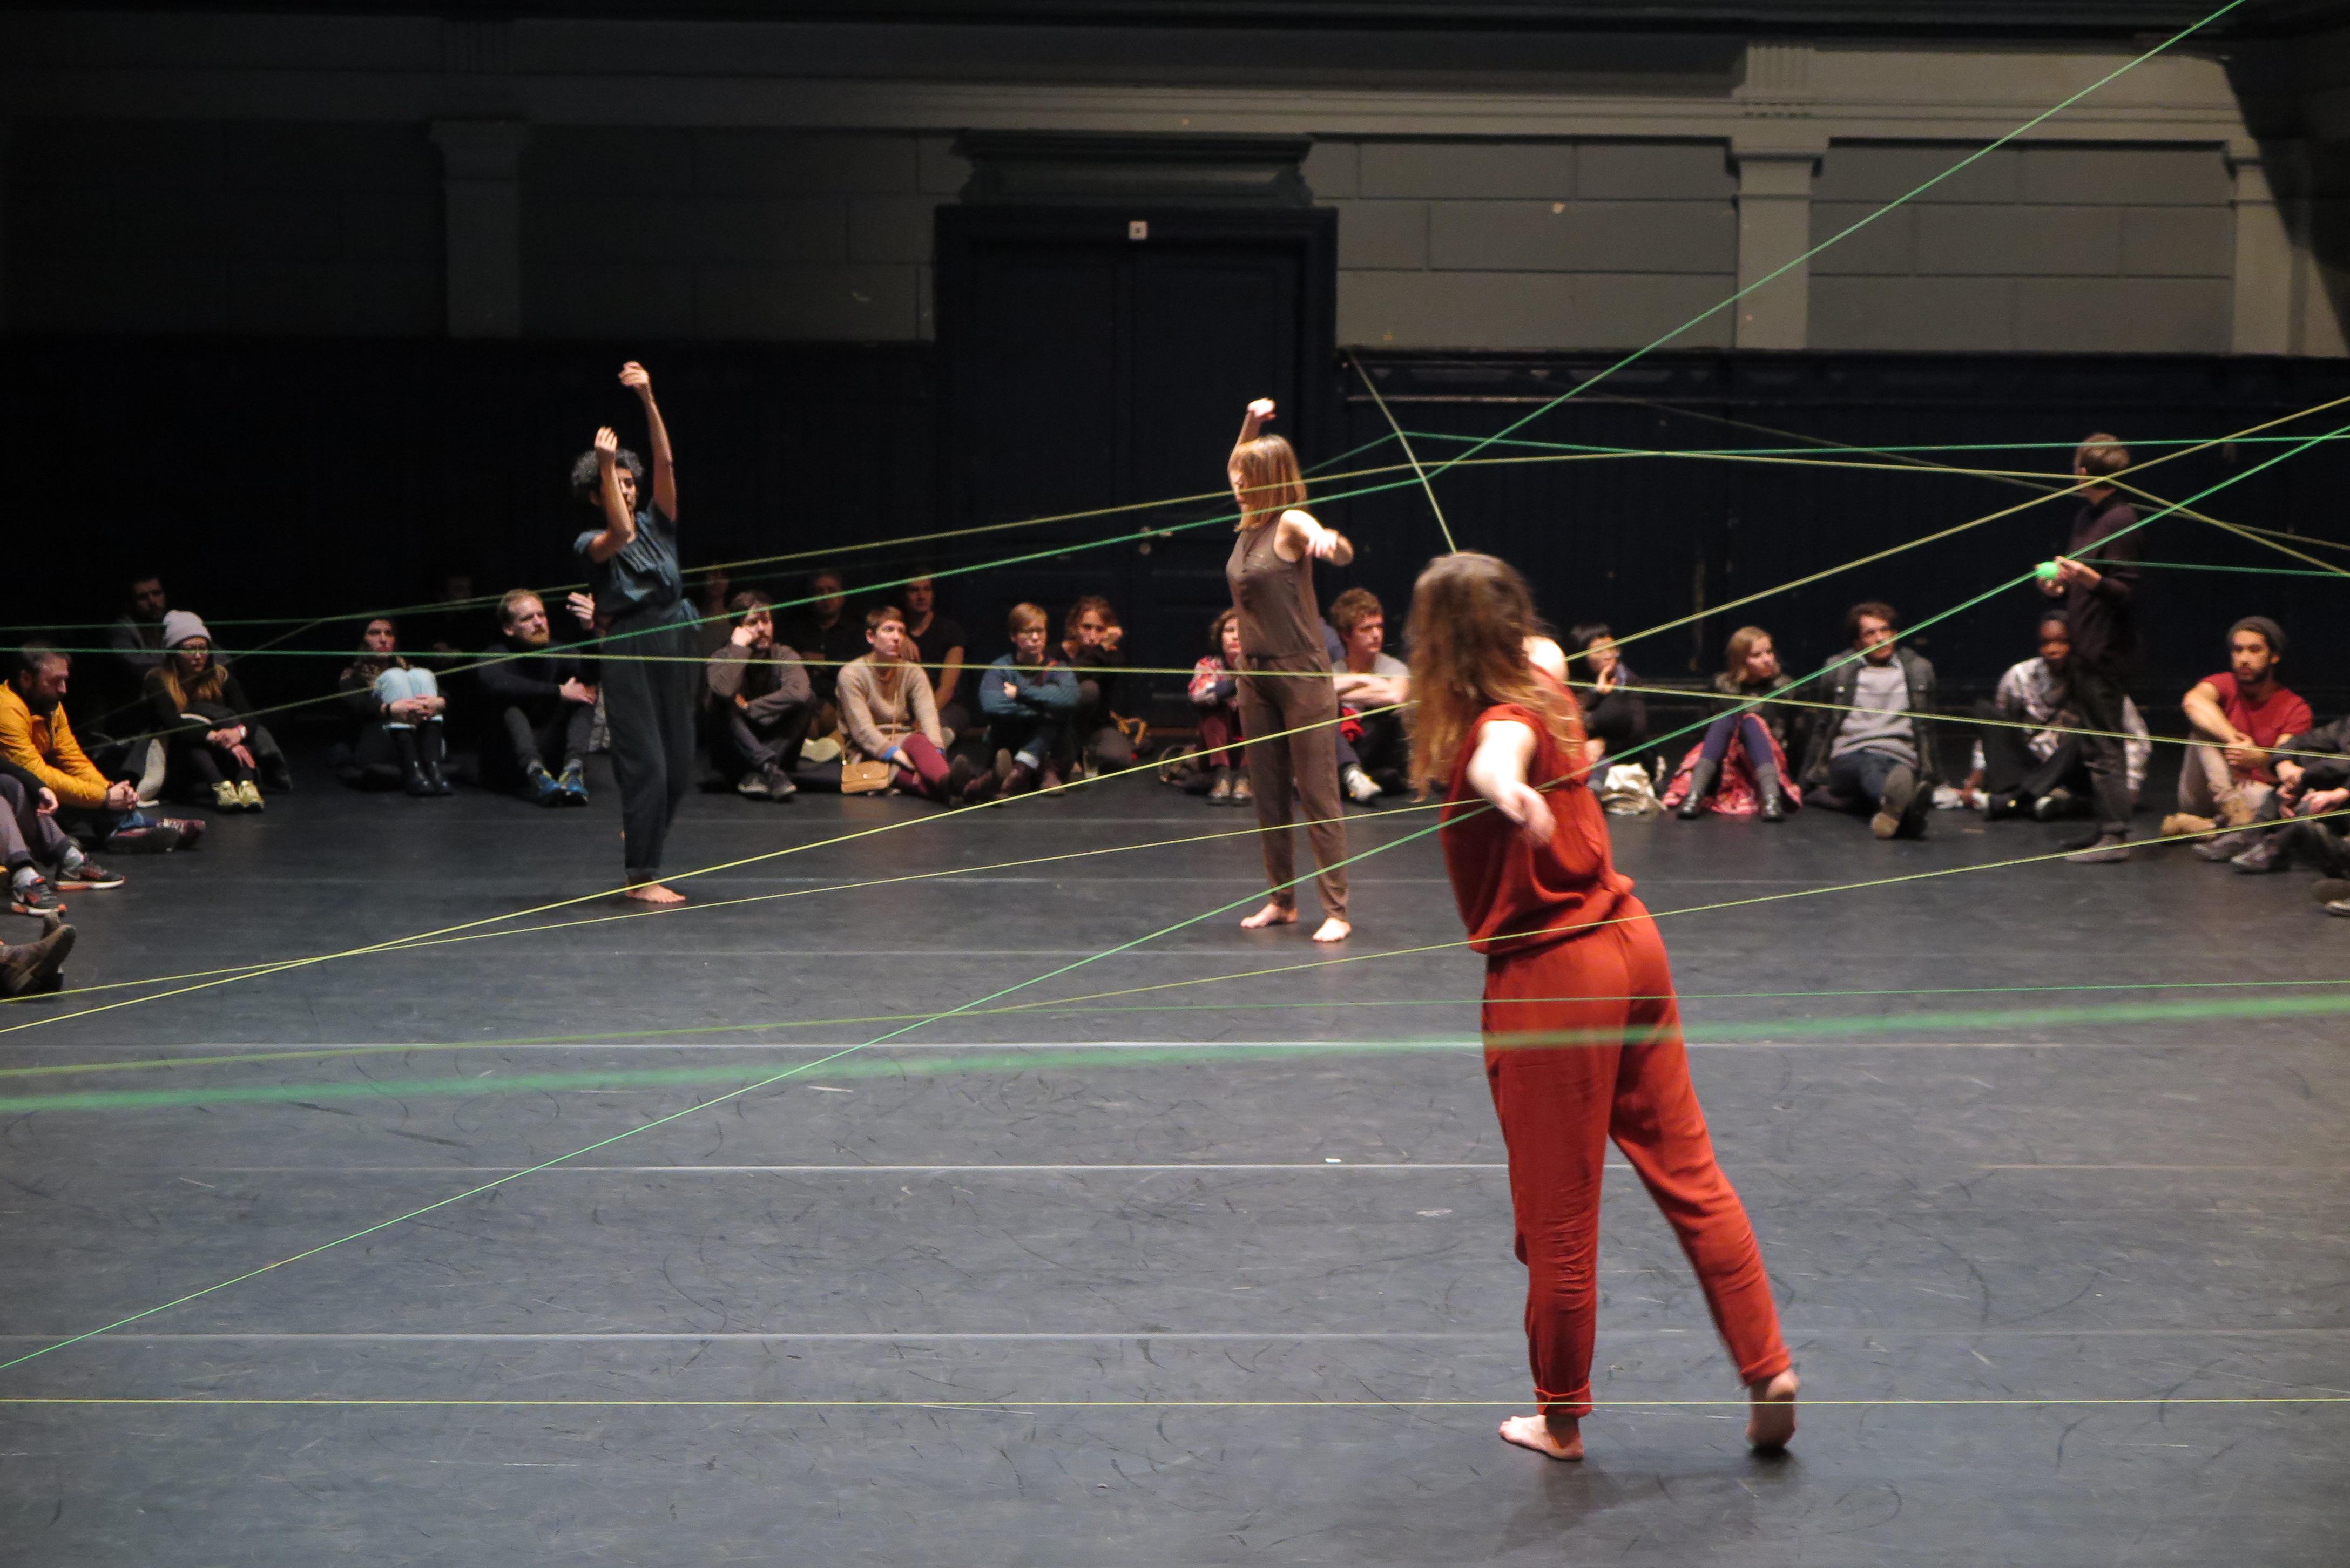 A Mile of Wool - Julia Willms & Andrea Bozic